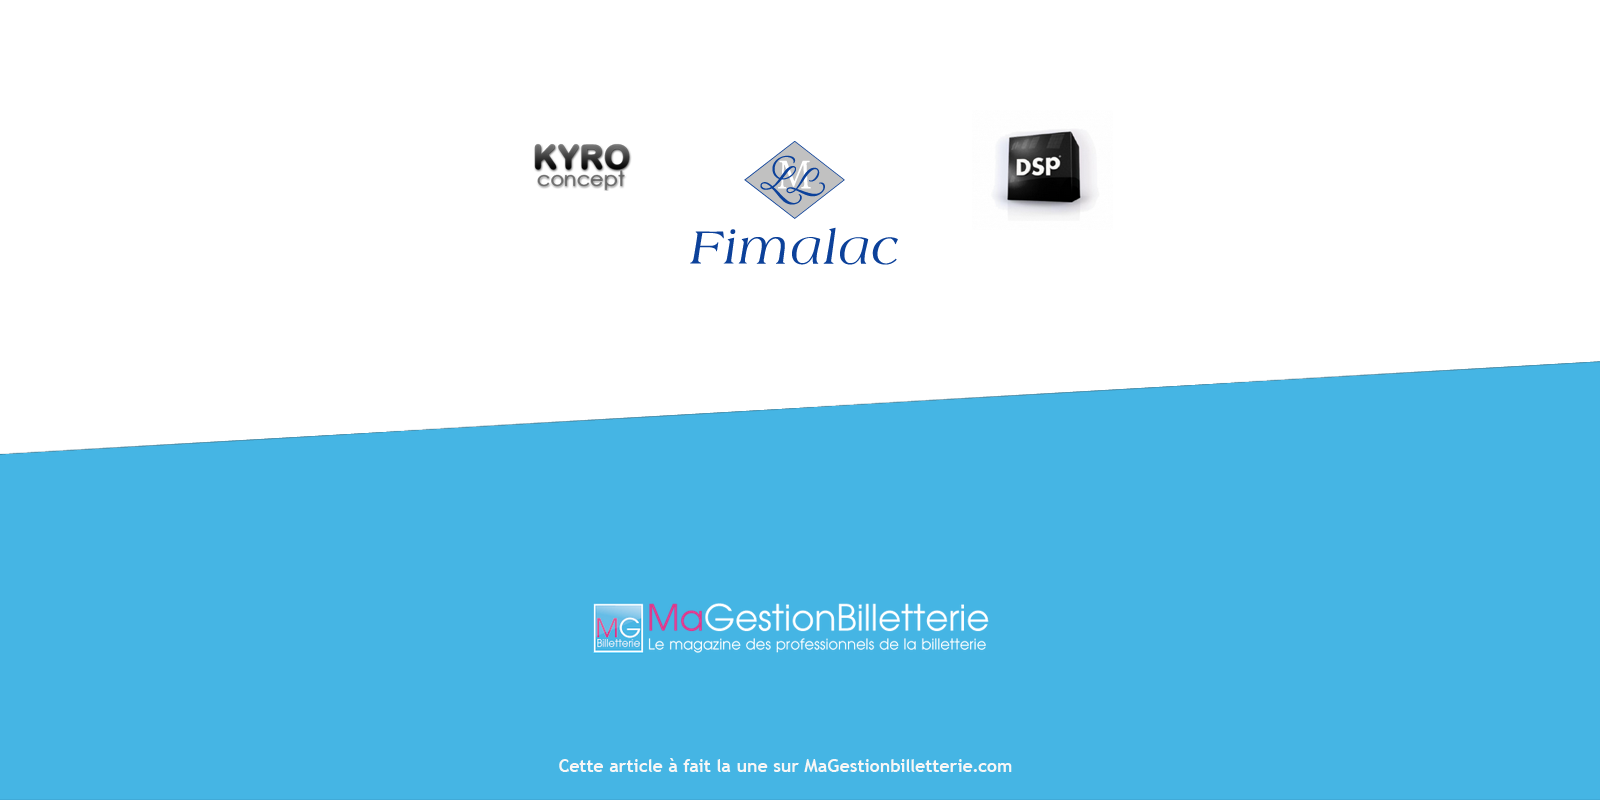 fimalac-kyro-dsp-une